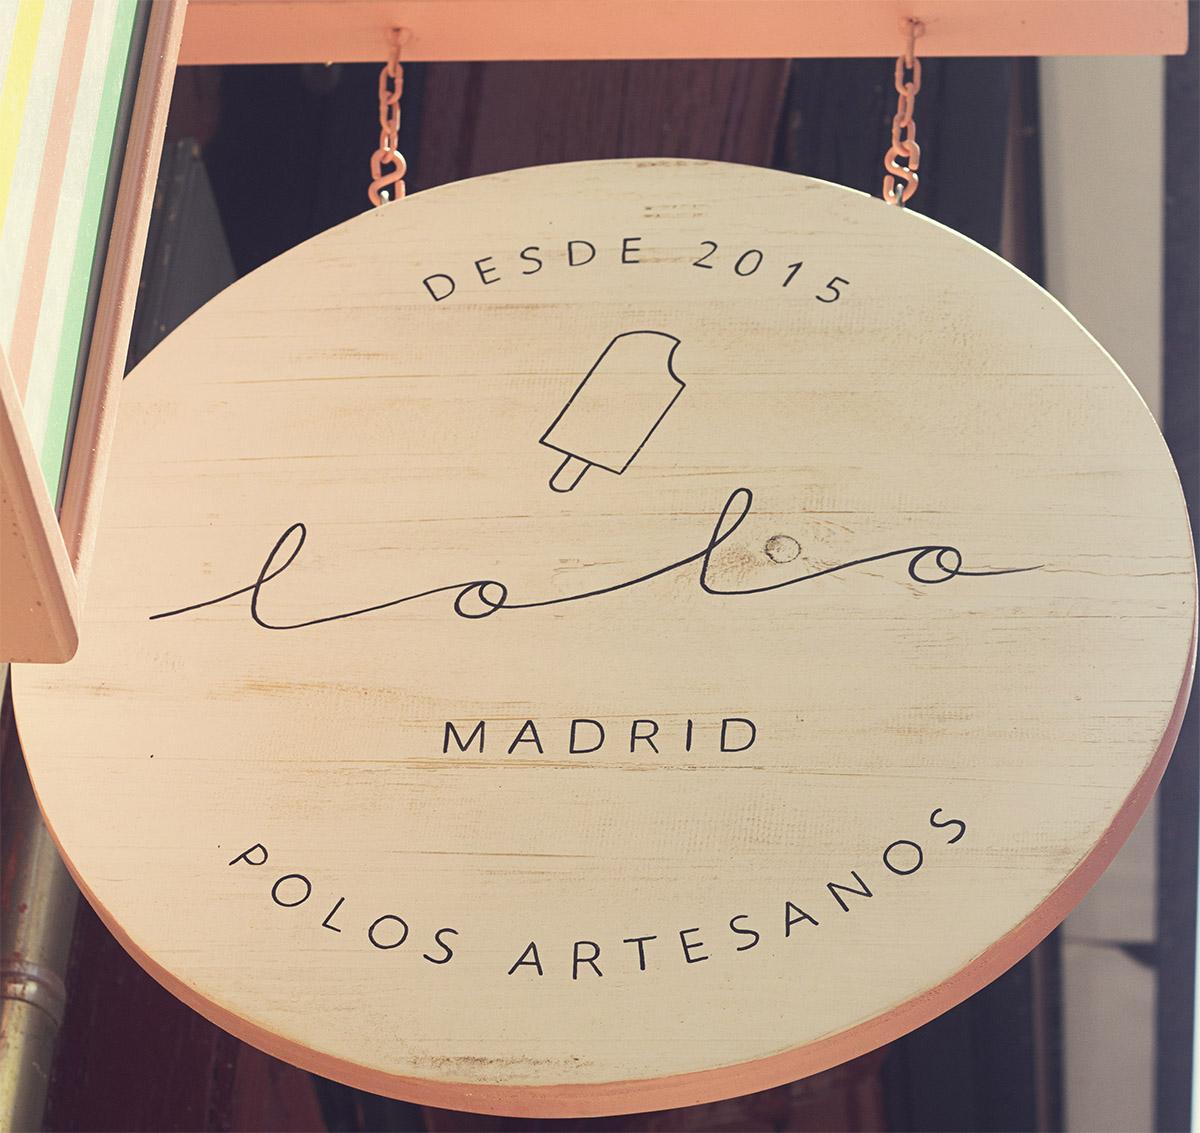 Lolo polos Chocolate agencia comunicación creatividad diseño gastronomía Madrid